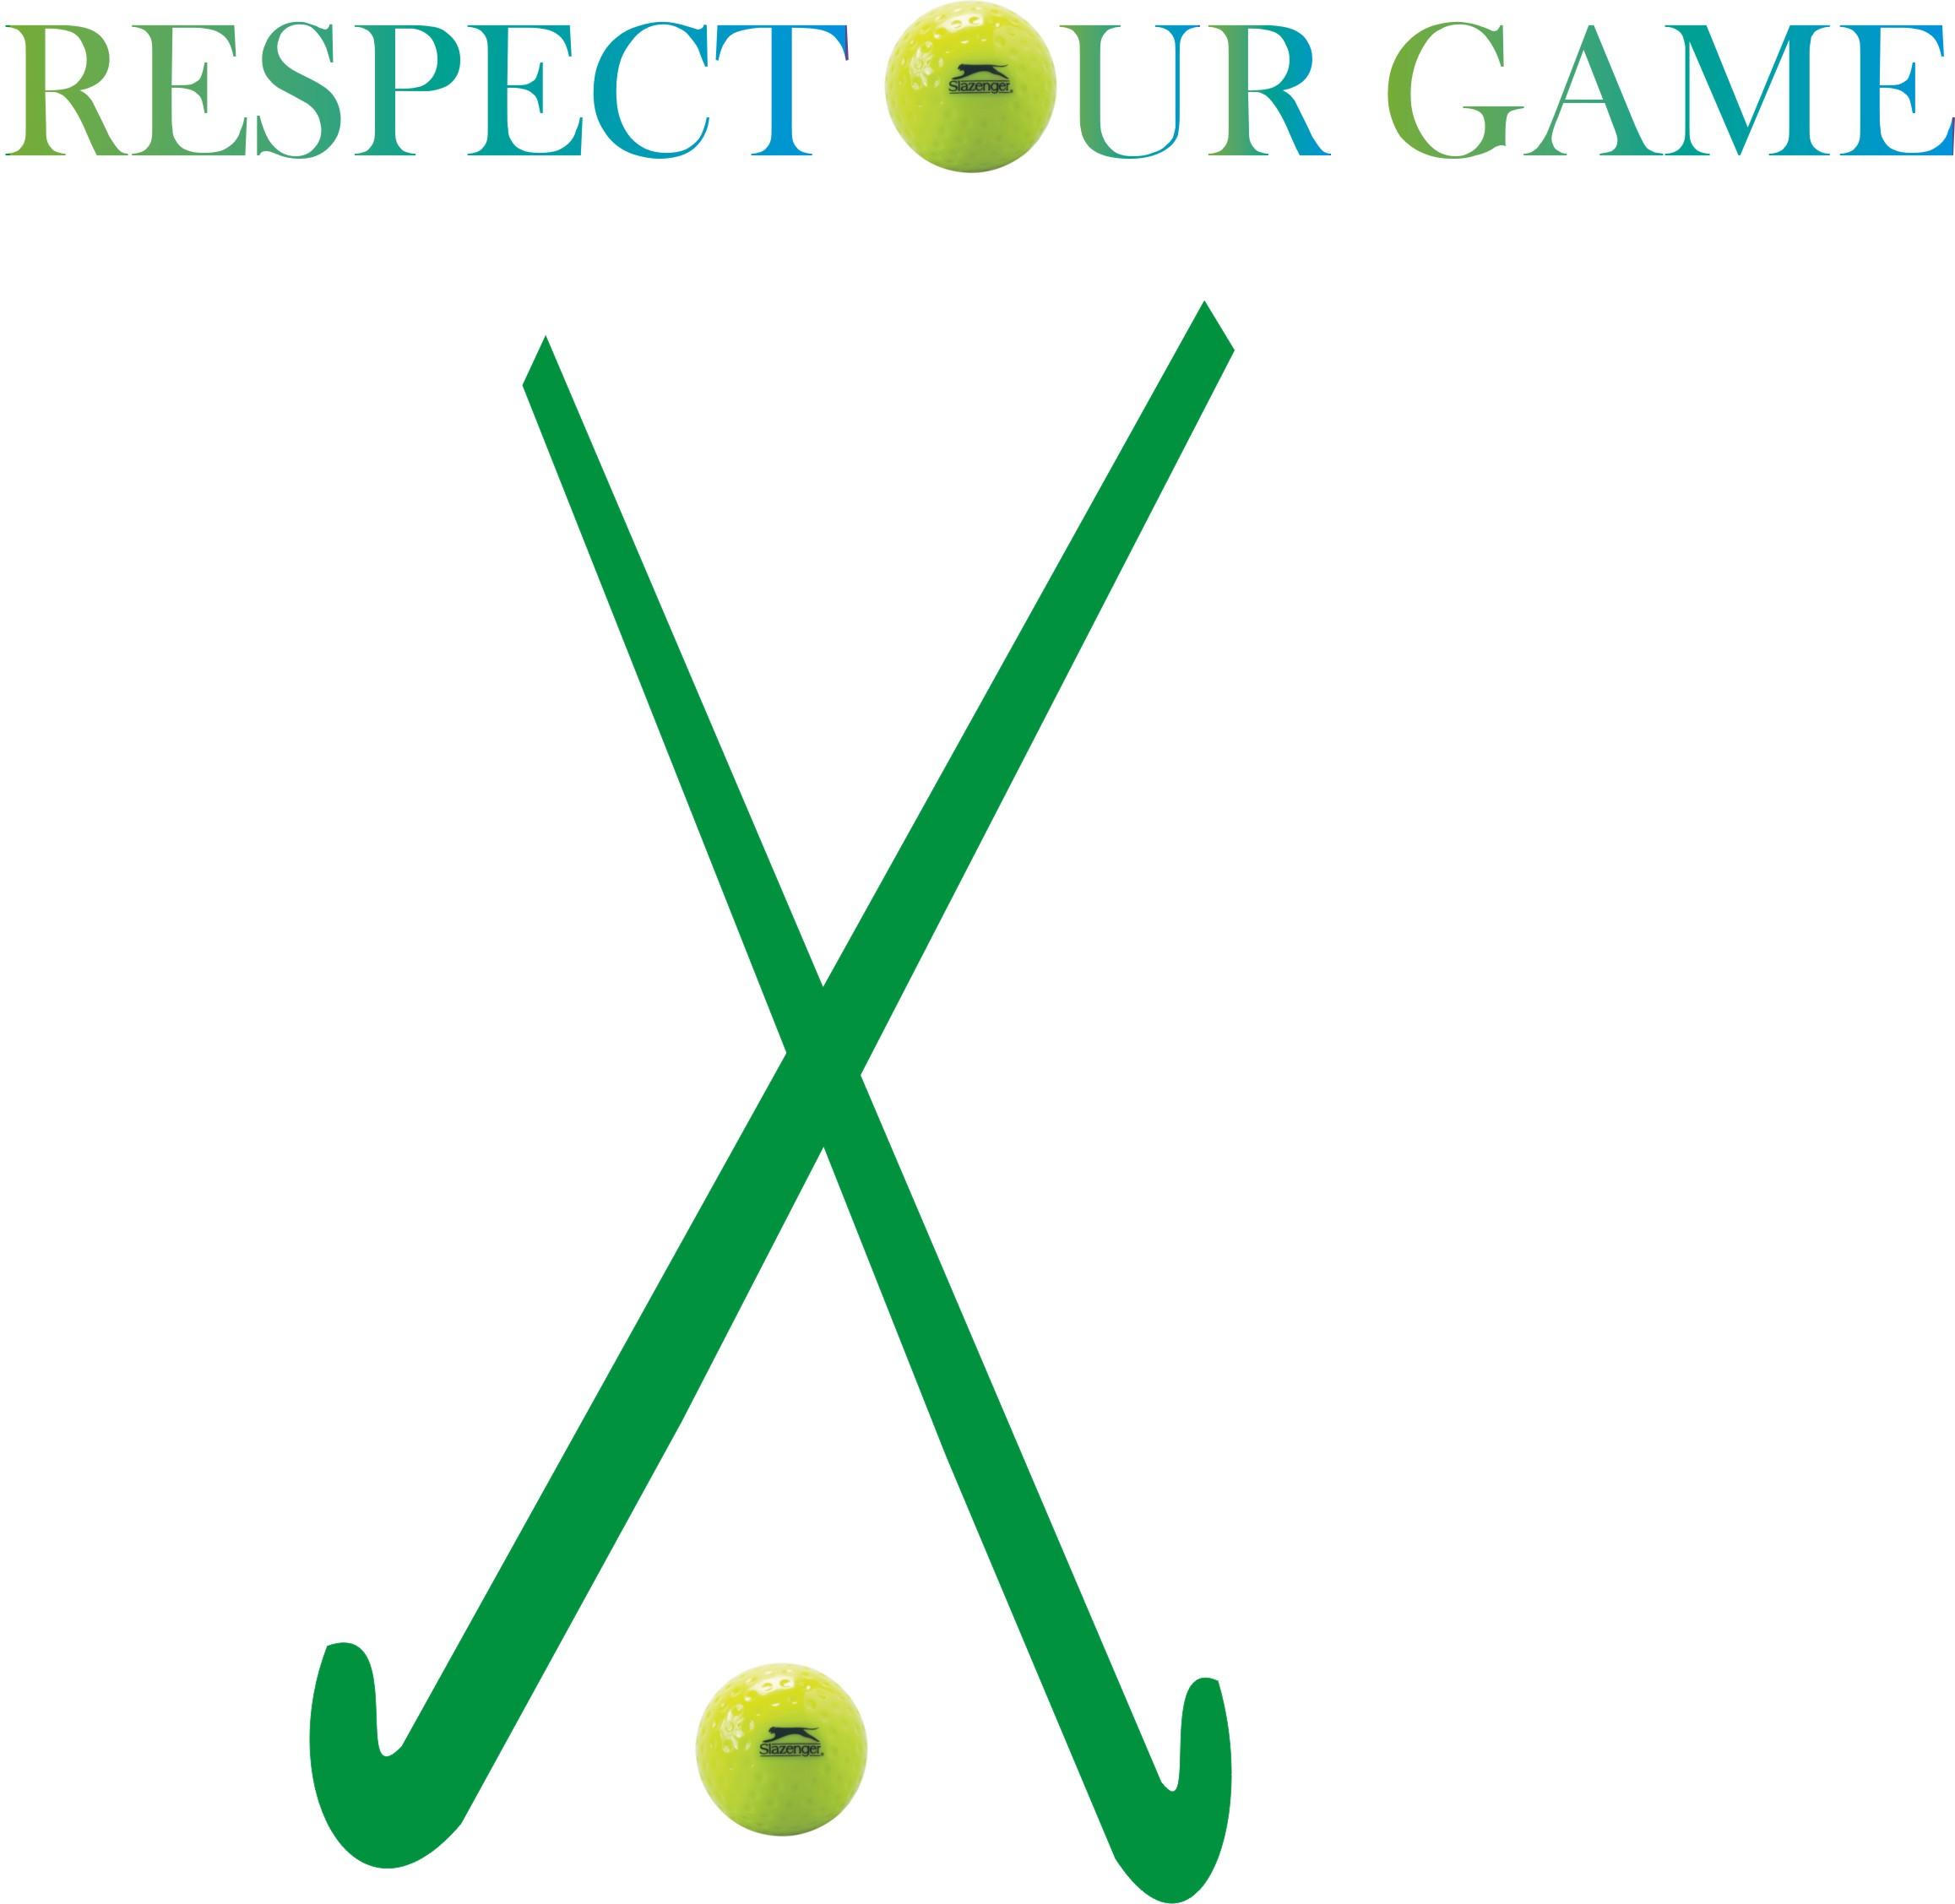 logo design contests 187 respect our game north van minor